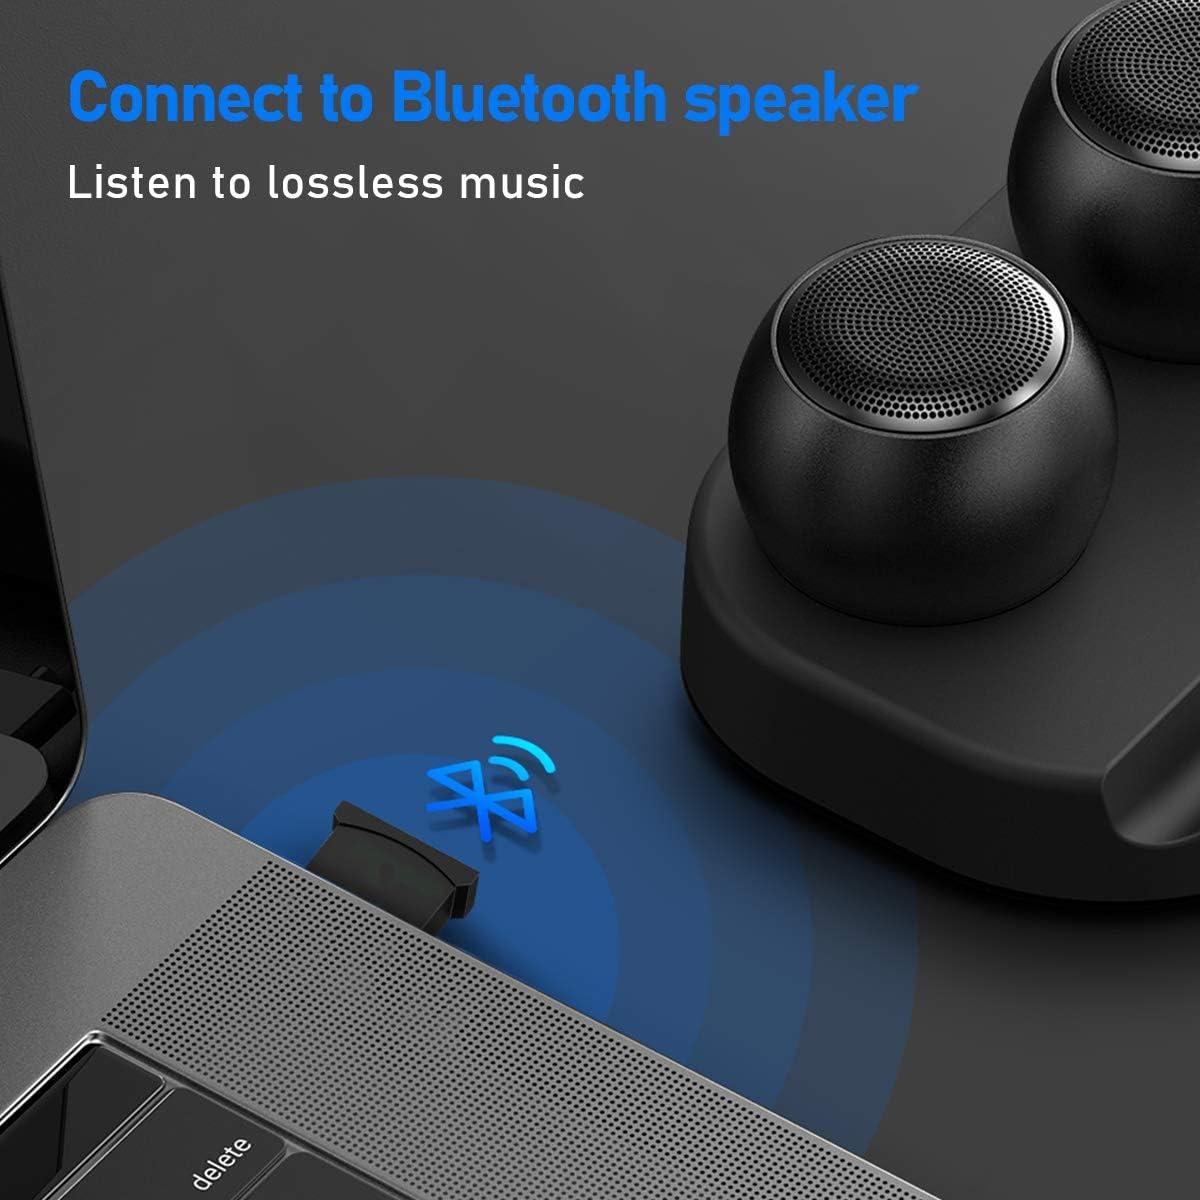 USB 5.0 Bluetooth Adapter Dongle Receiver Drahtloser Sender f/ür Computer Laptop Stereo Kopfh/örer Kompatibel mit Windows 10//8.1//8//7 XP//Vista innOrca Bluetooth Adapter f/ür PC